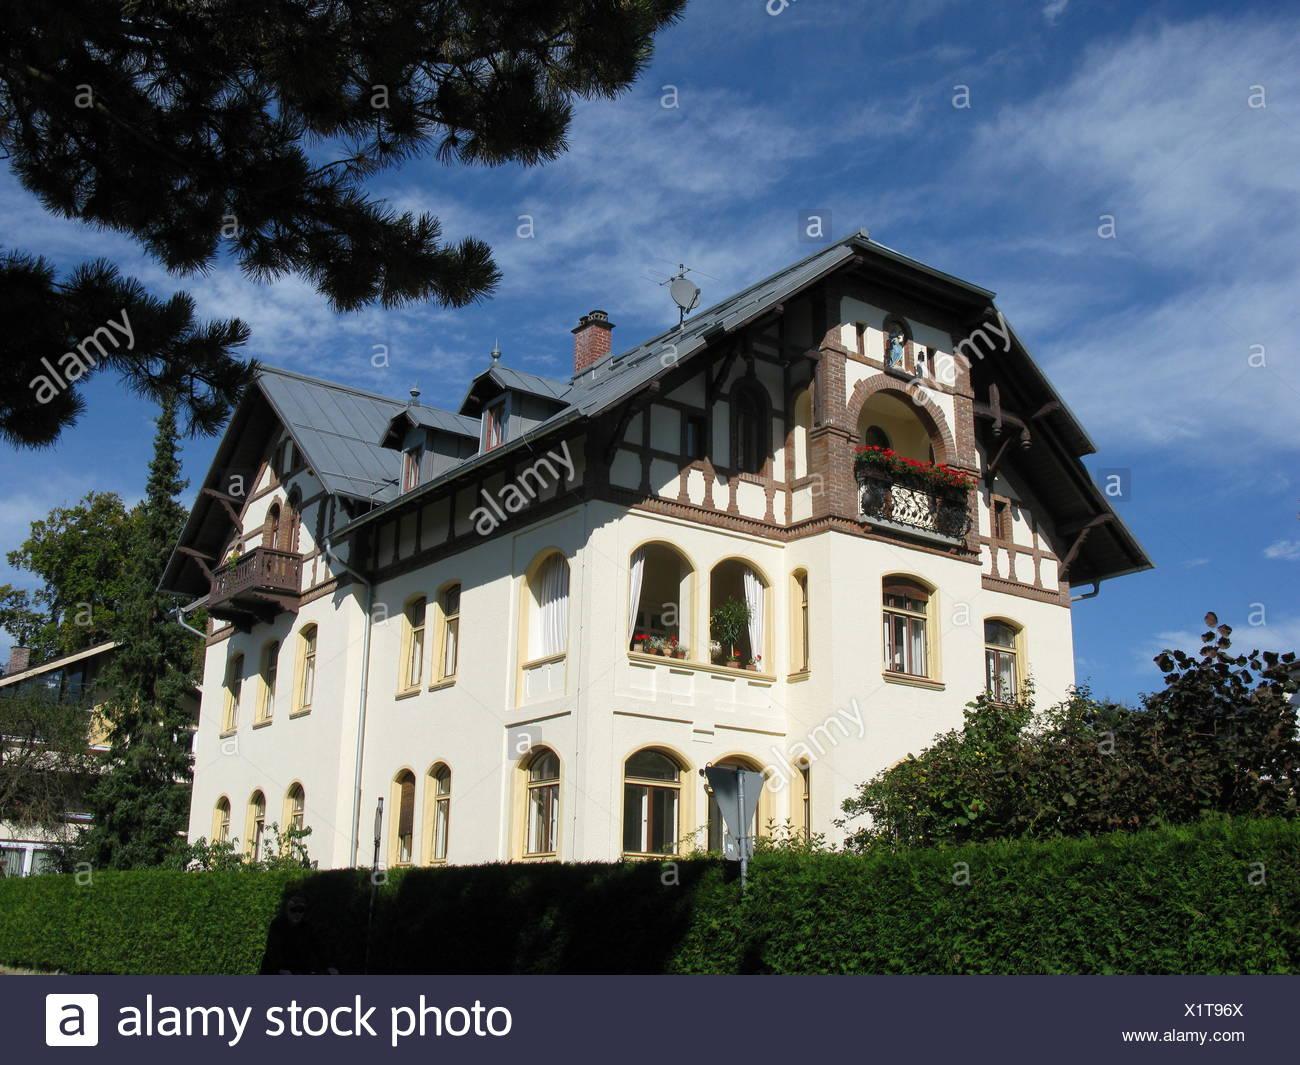 Haus in Tutzing am Starnberger See Stockfoto, Bild: 276514642 - Alamy